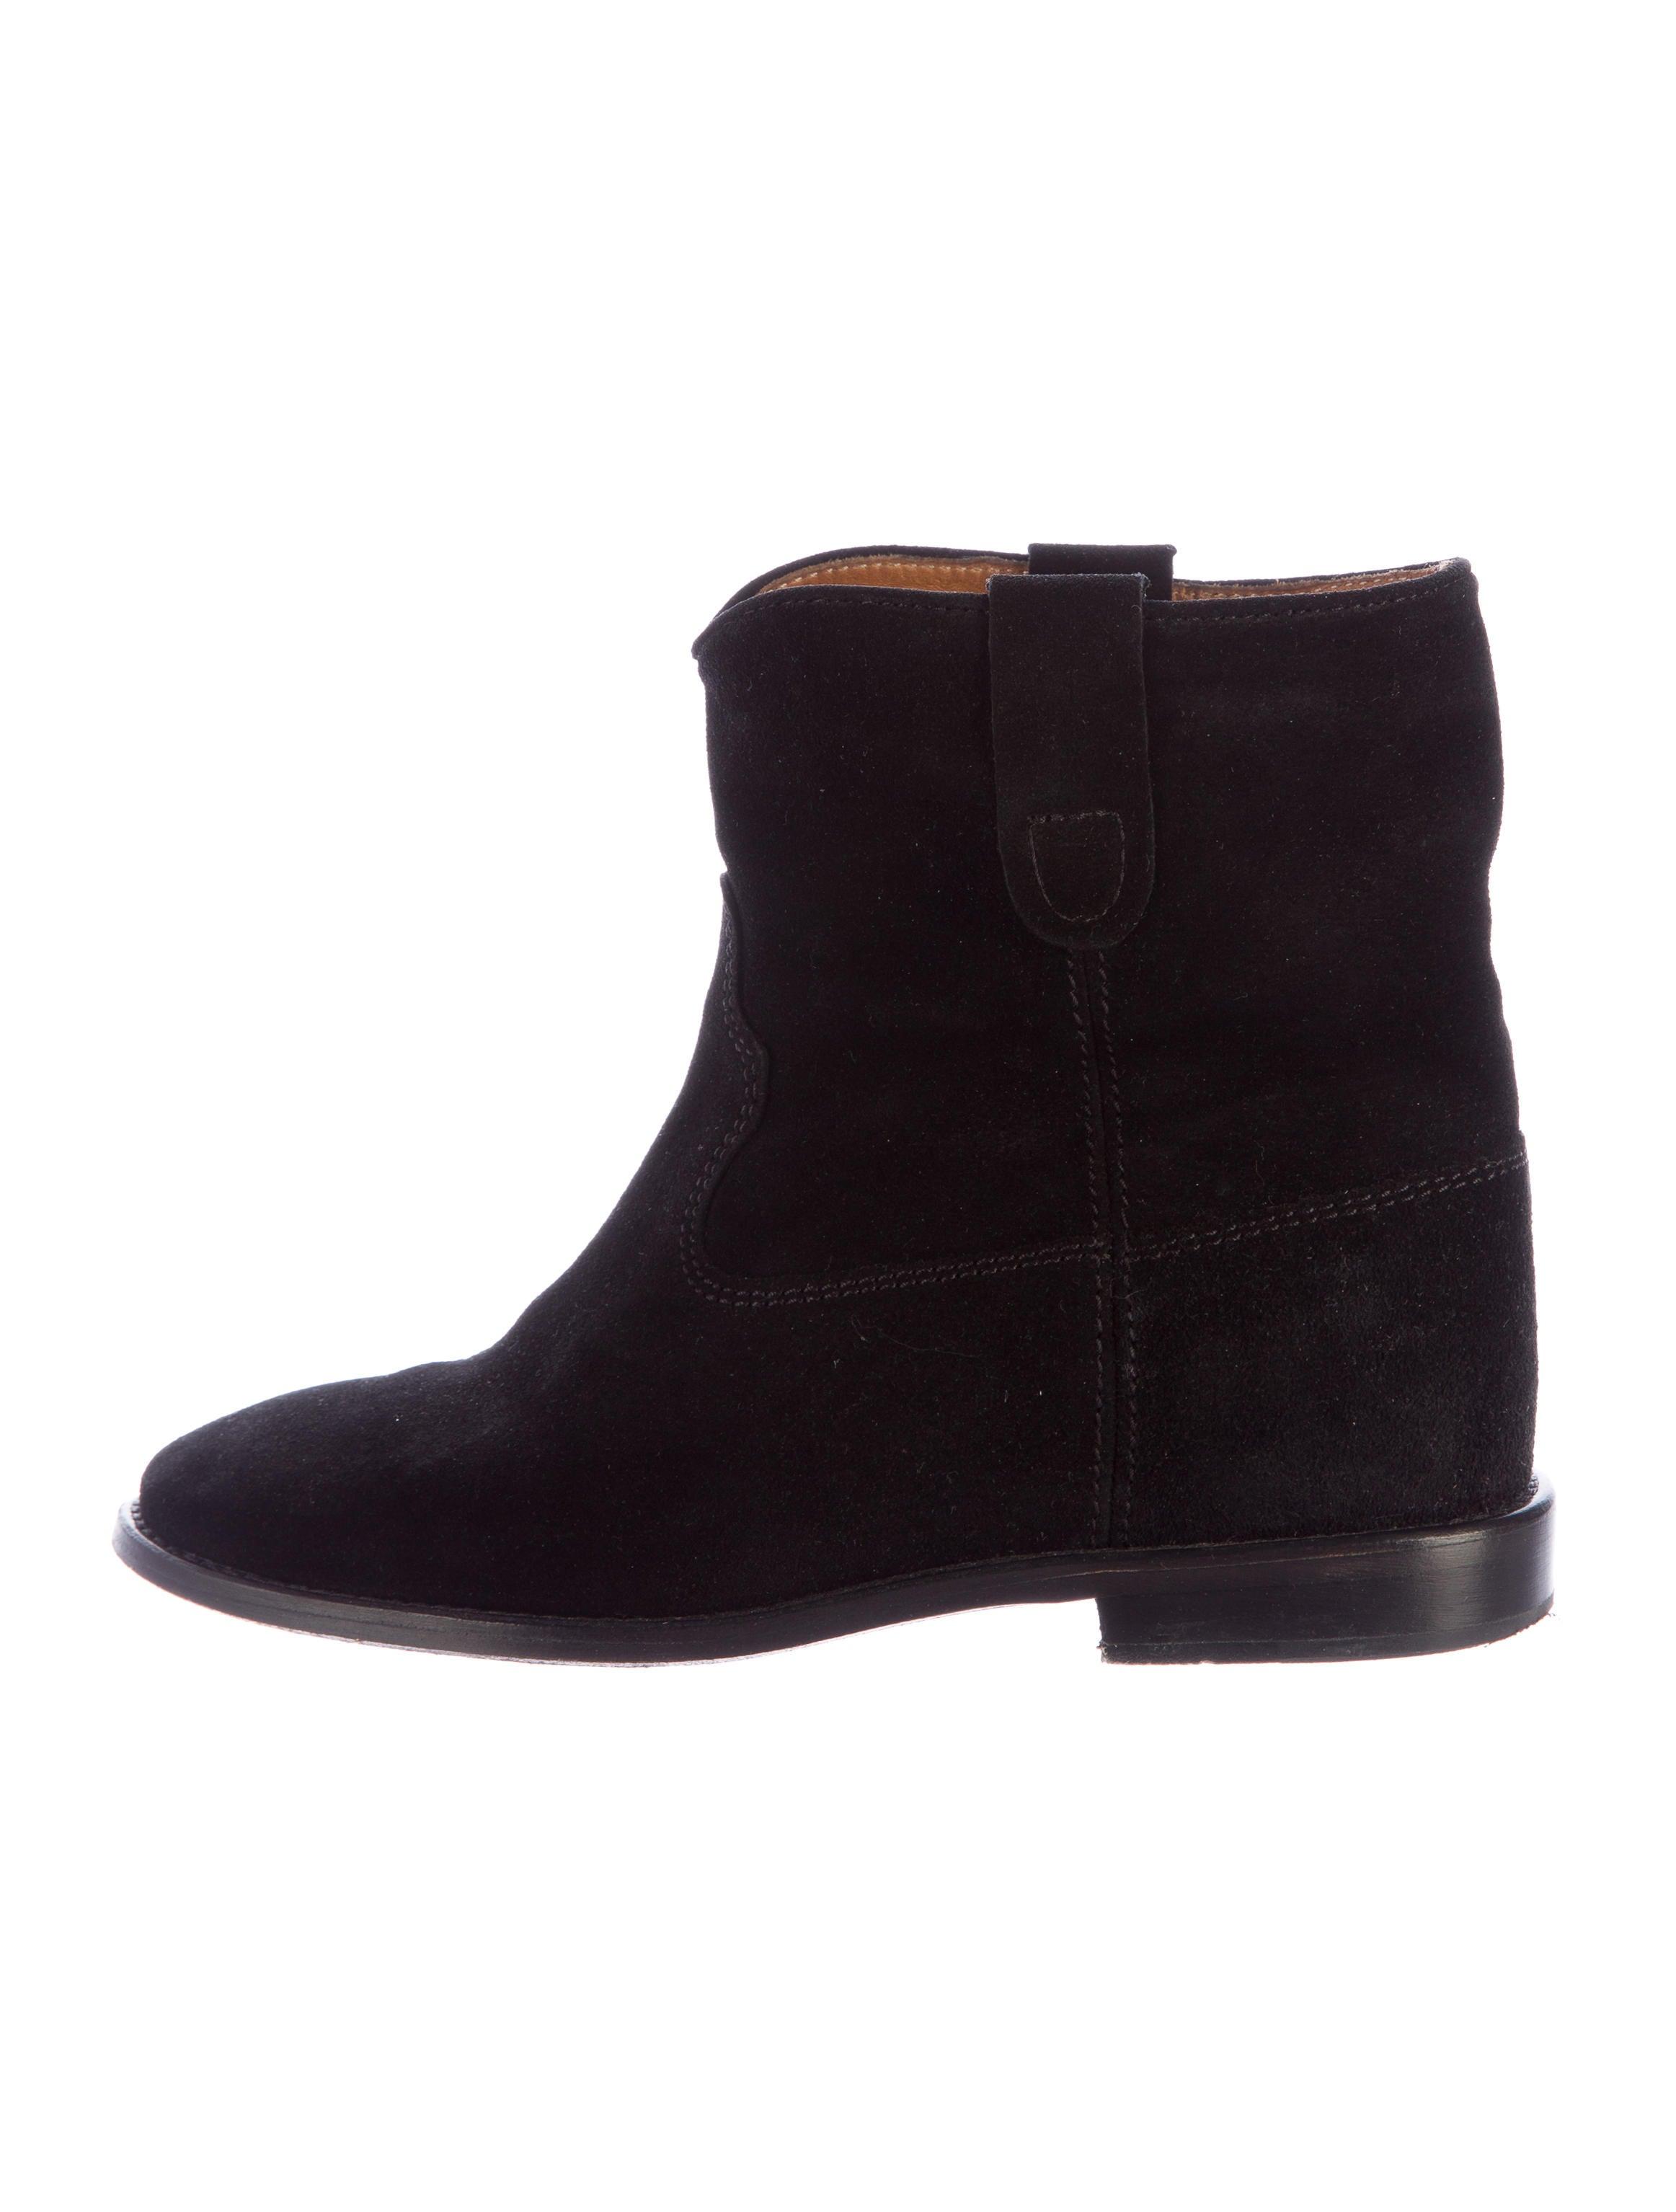 201 toile marant crisi suede boots shoes wet37274